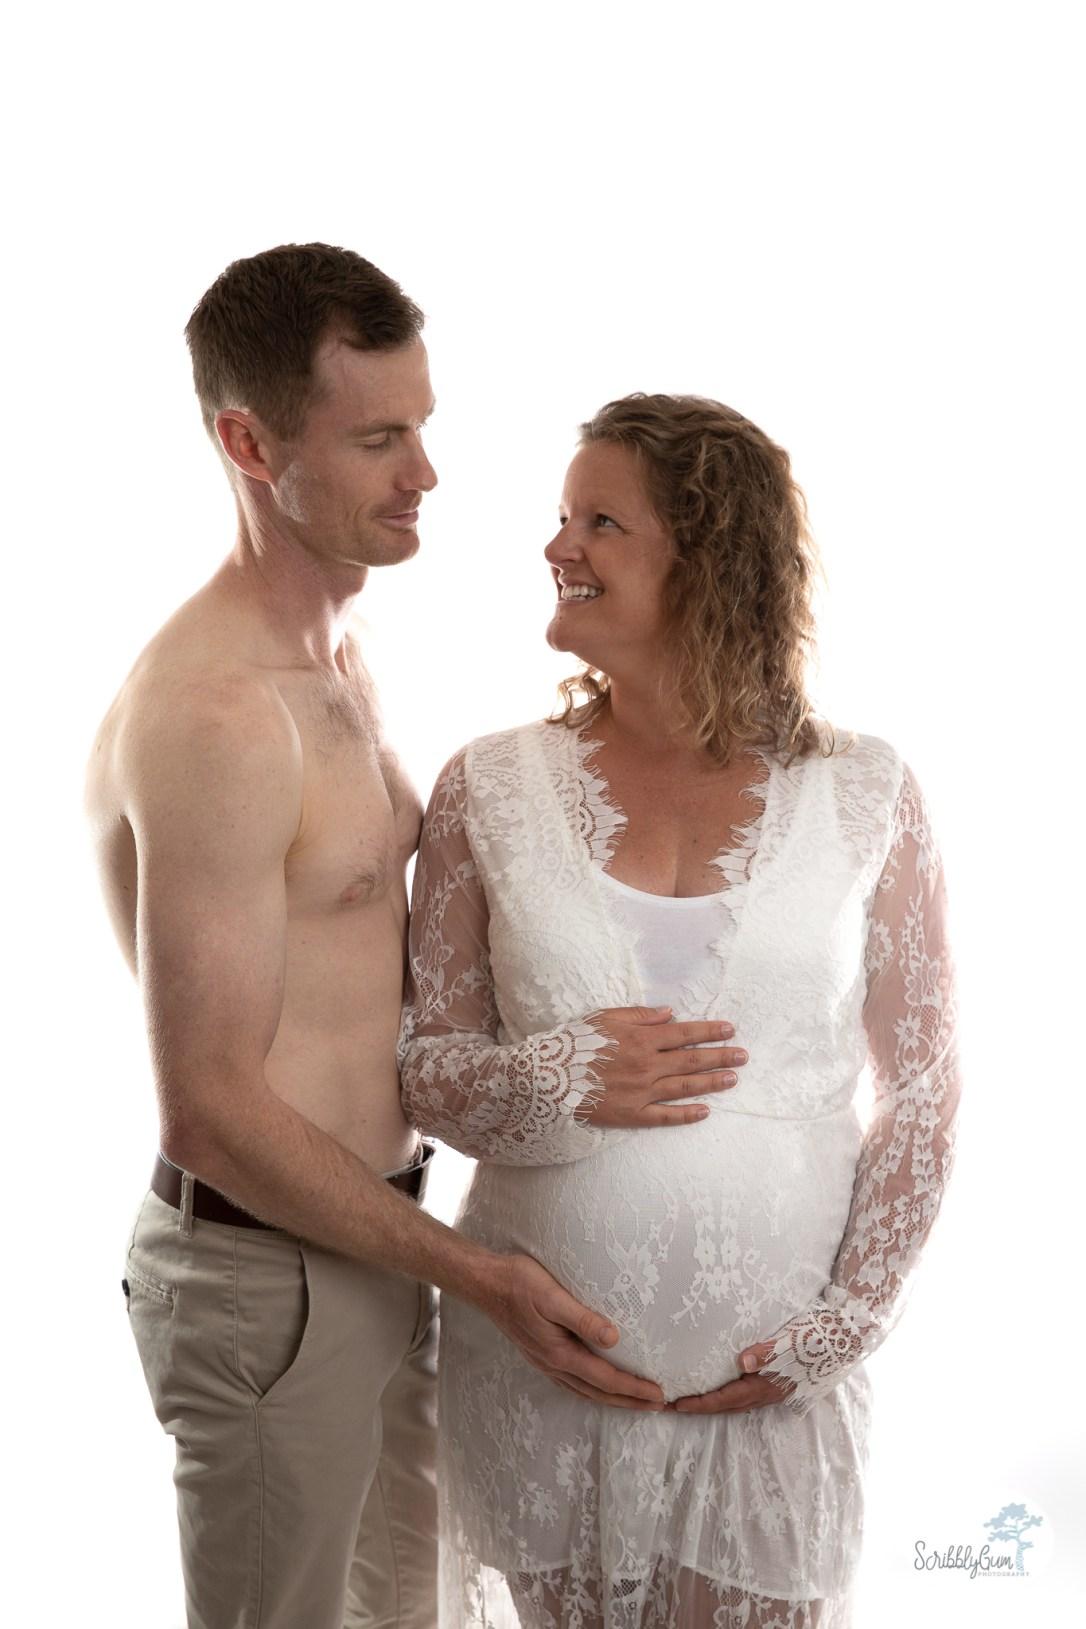 Professional Maternity Photoshoot indoor studio in home